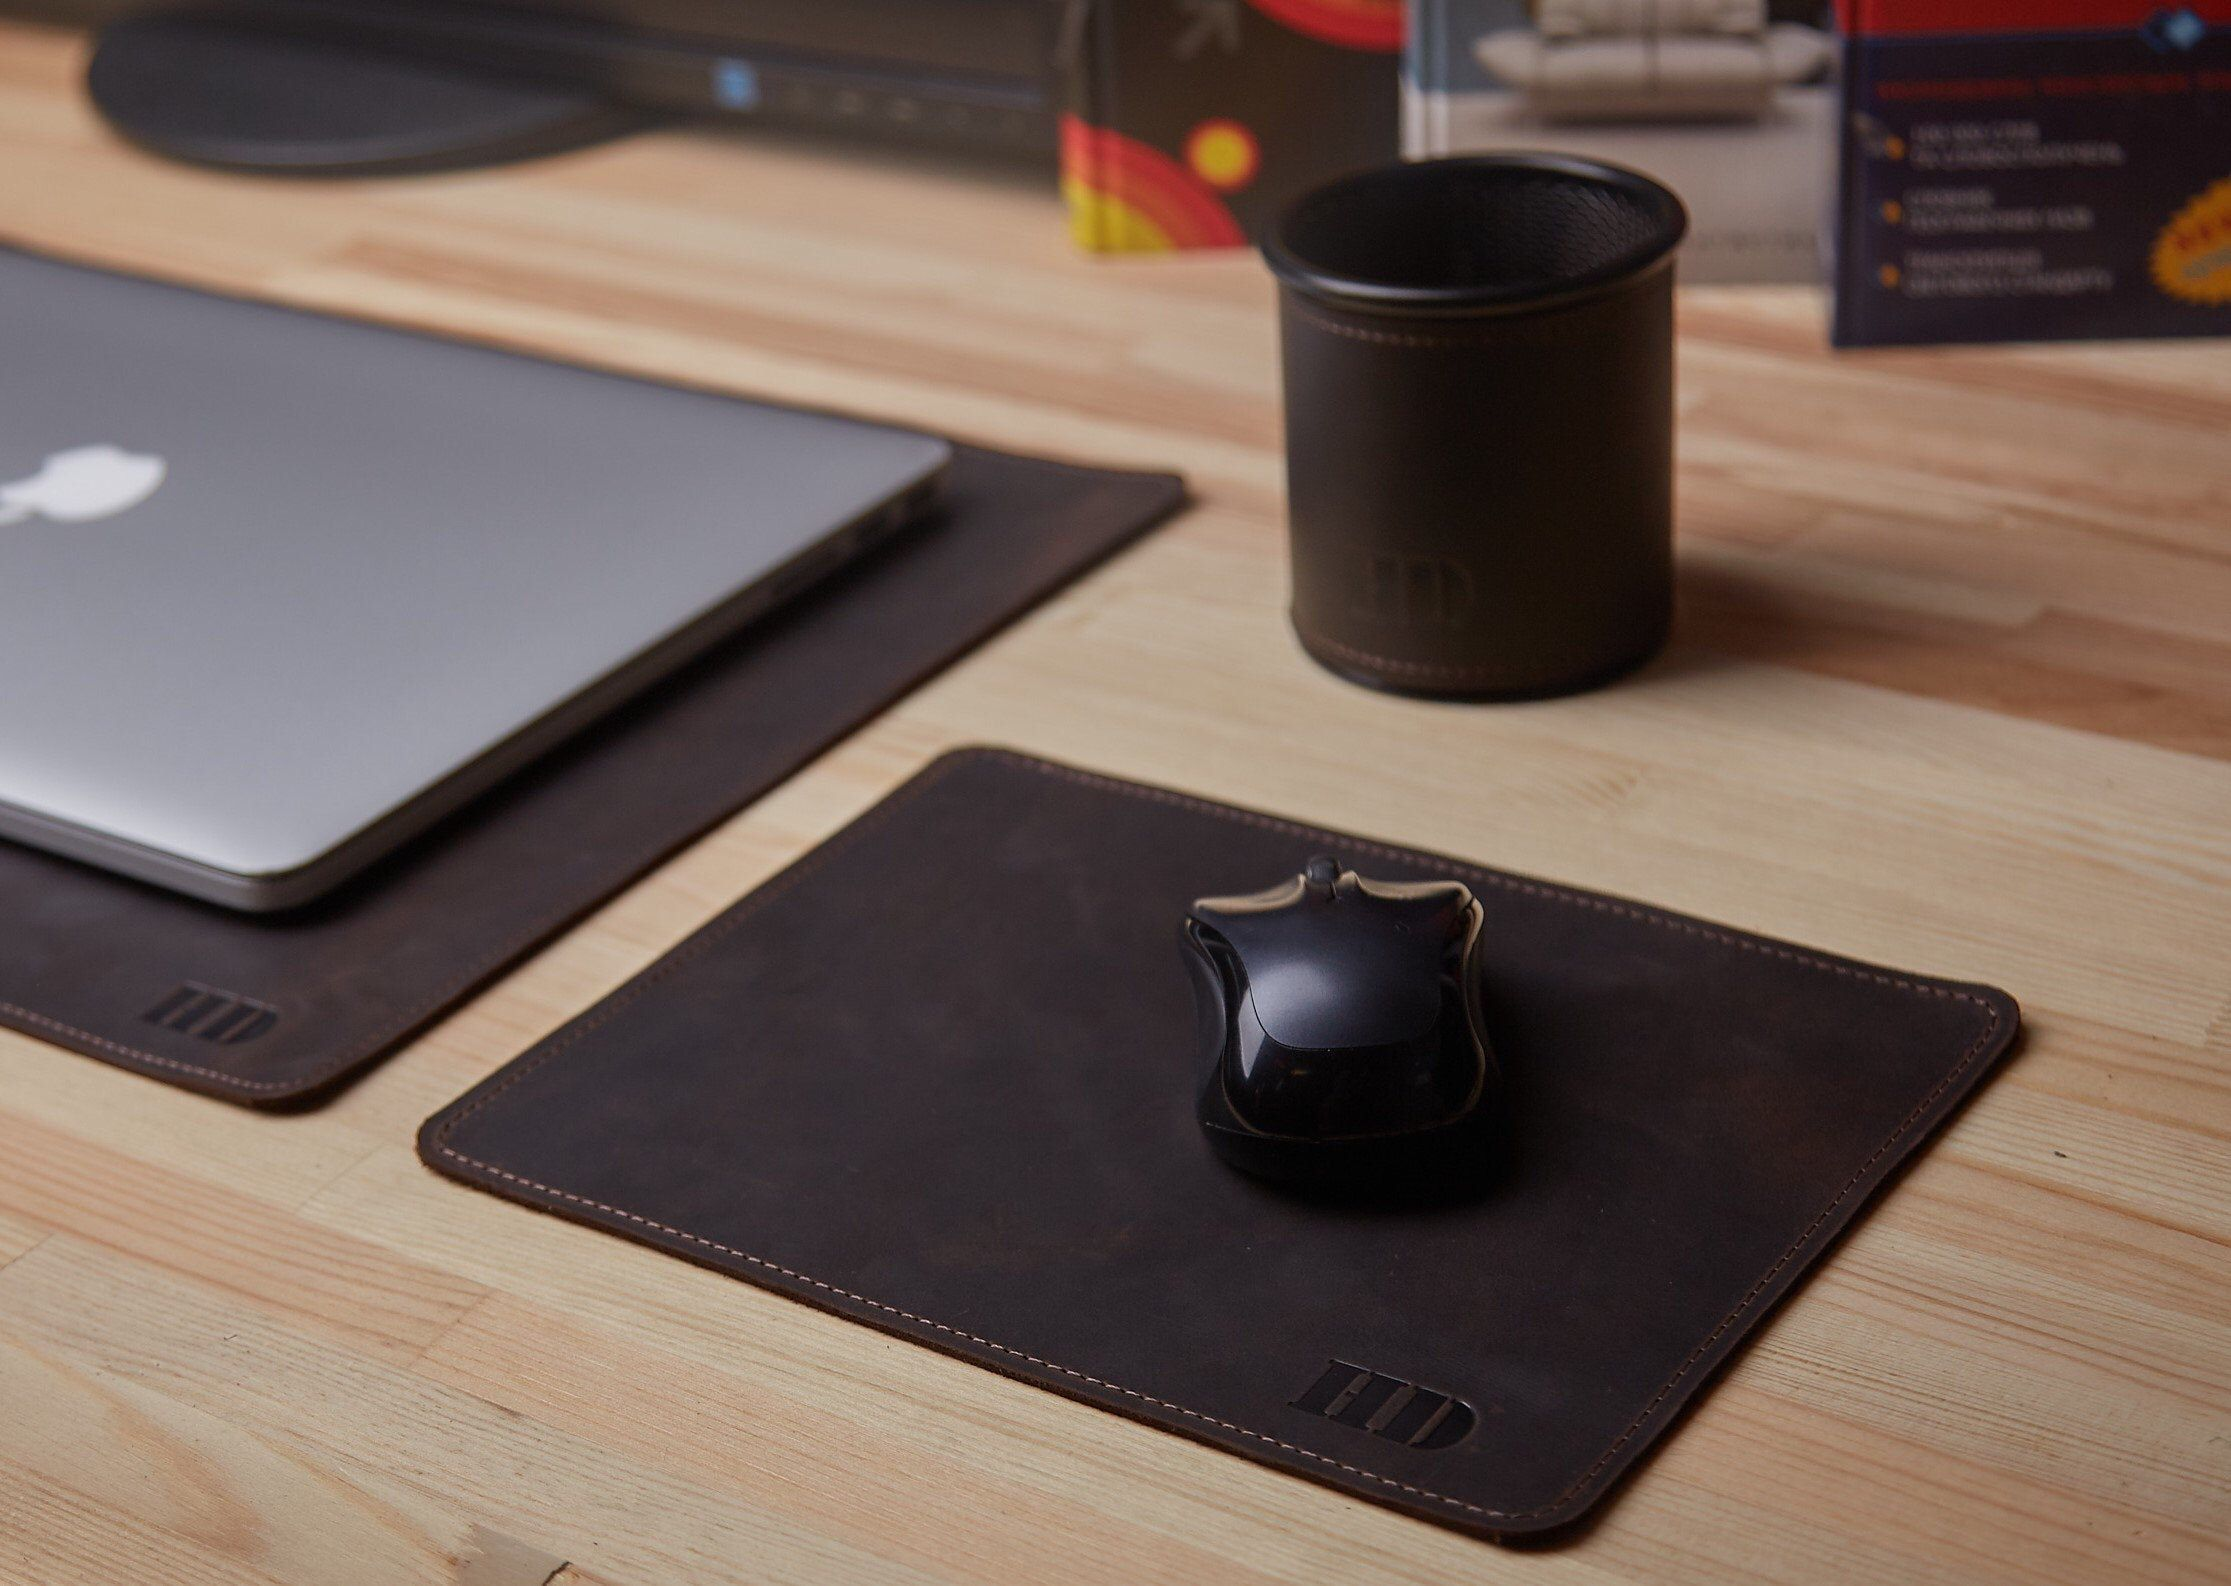 New Photographs Office Desk Accessories Office Desk Accessories